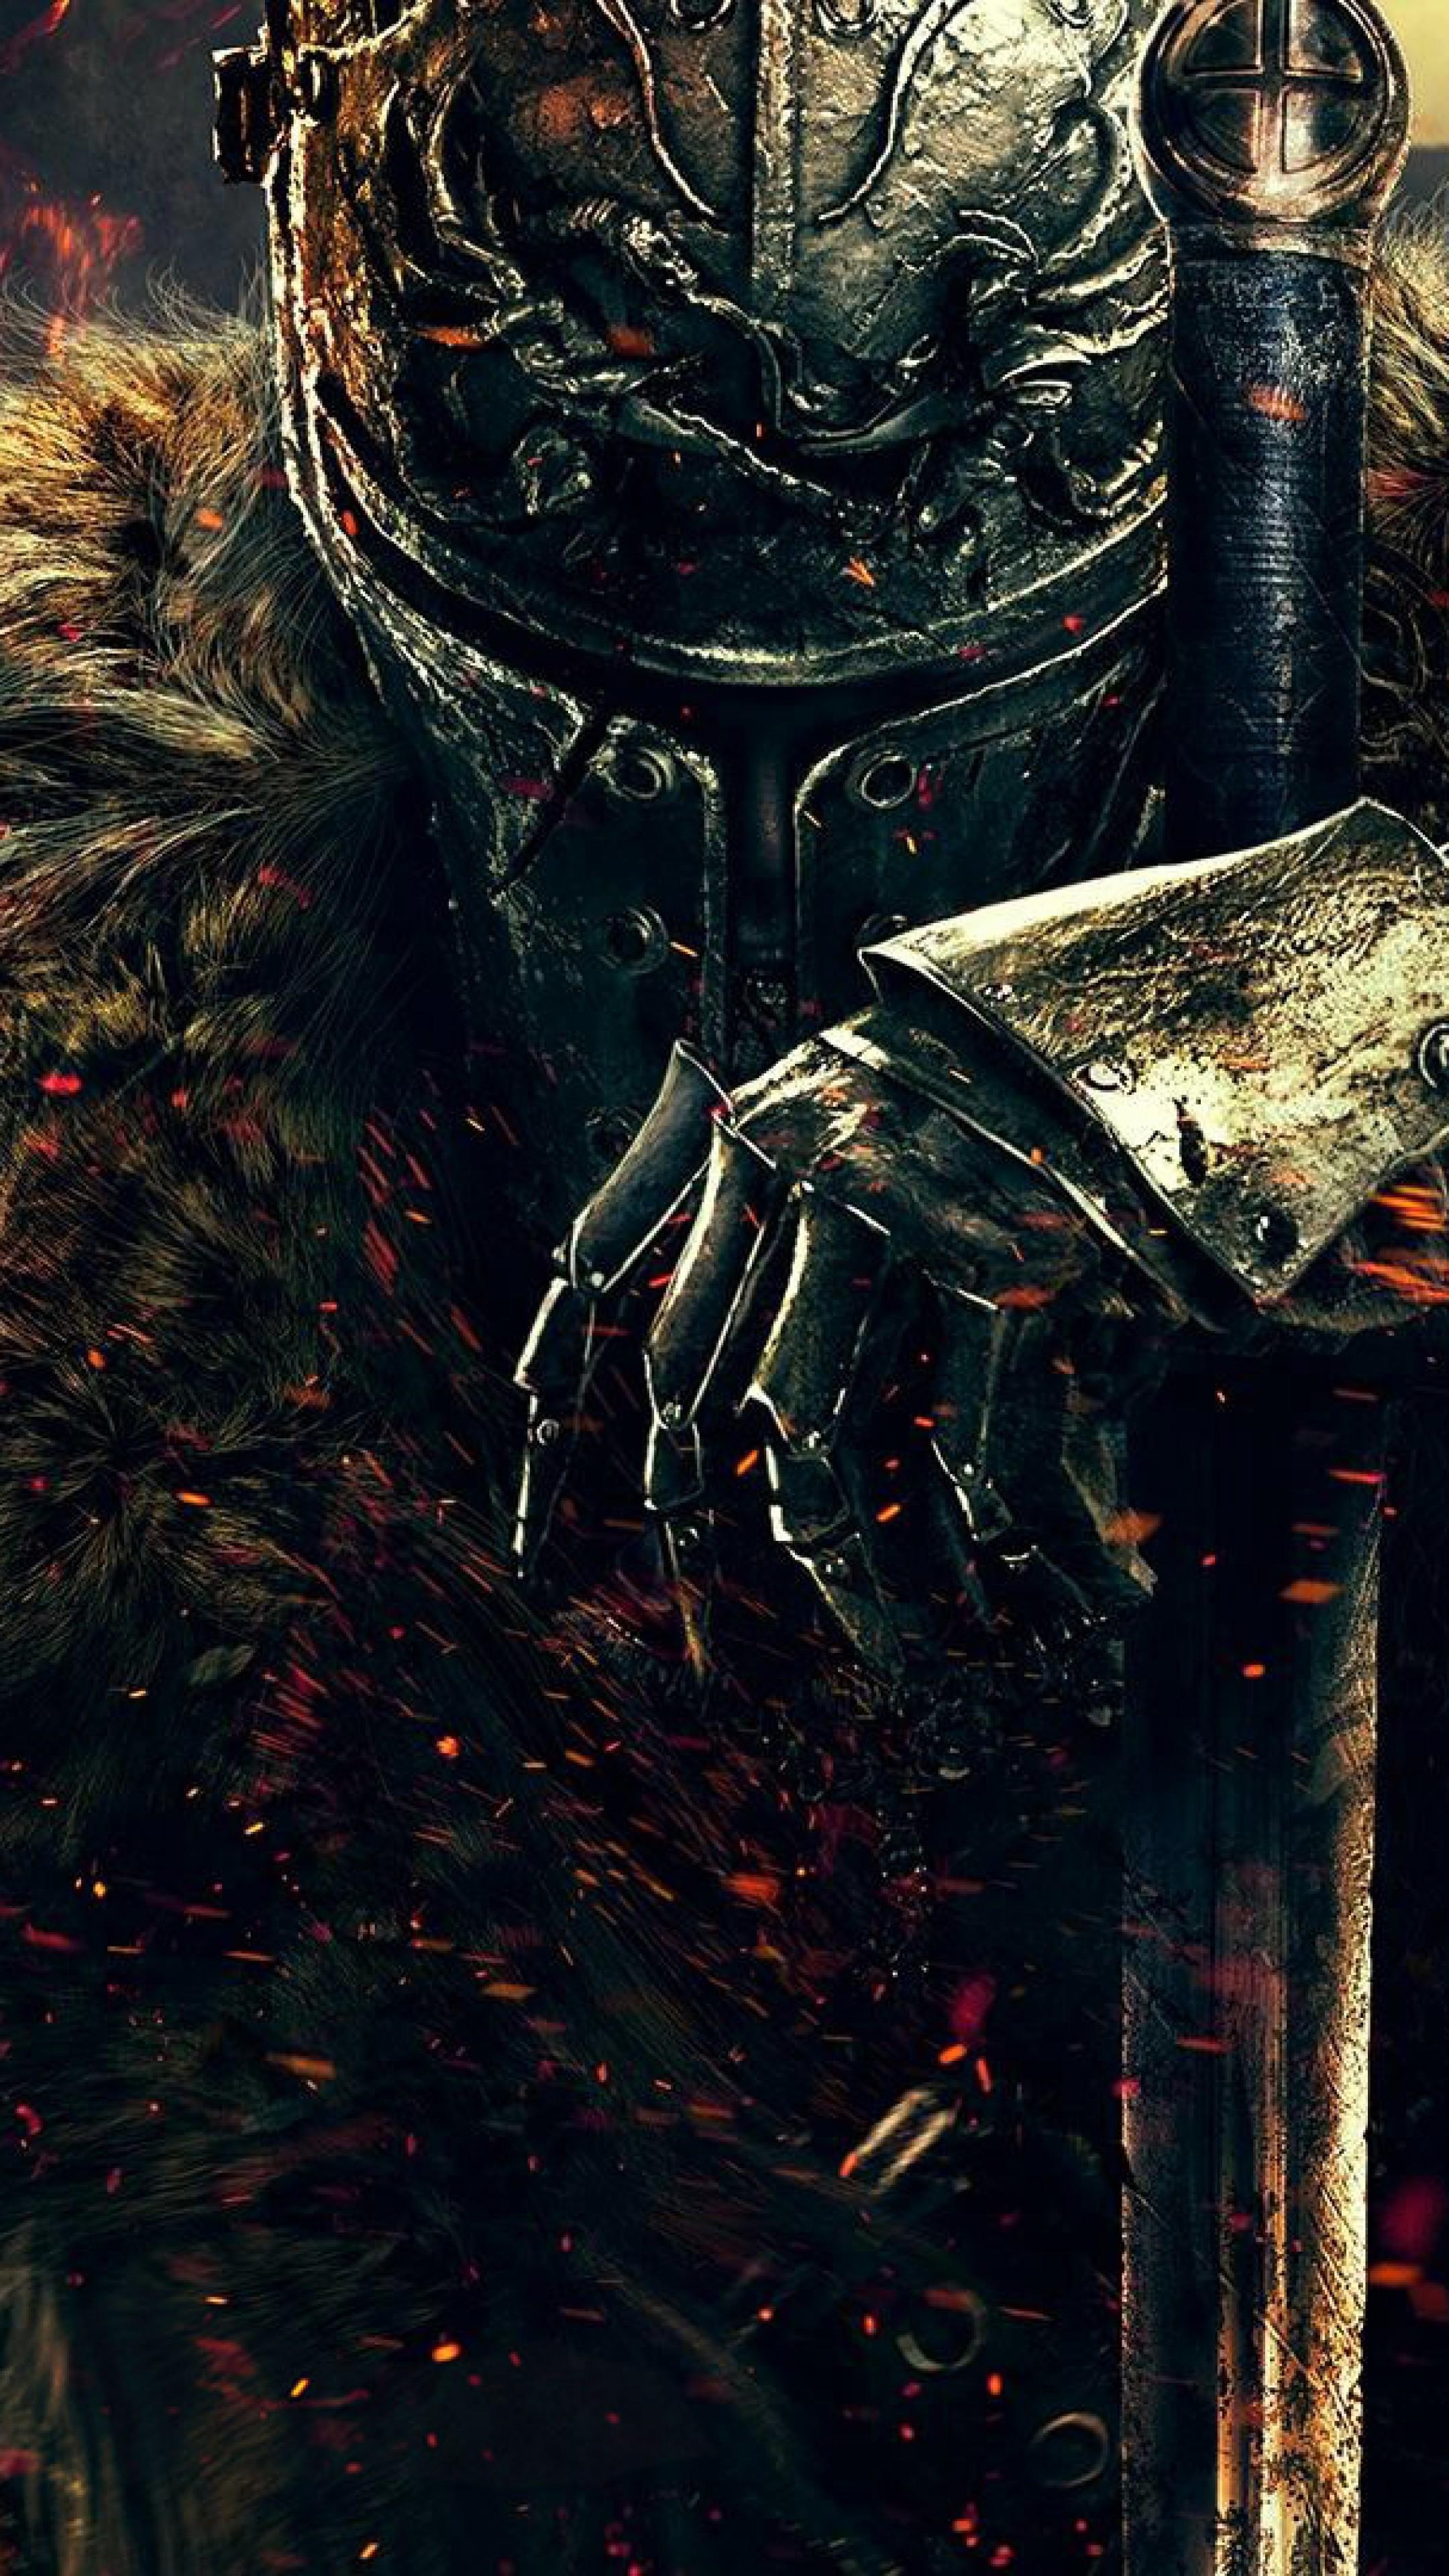 3840x2160 Awesome Dark Souls III Wallpaper